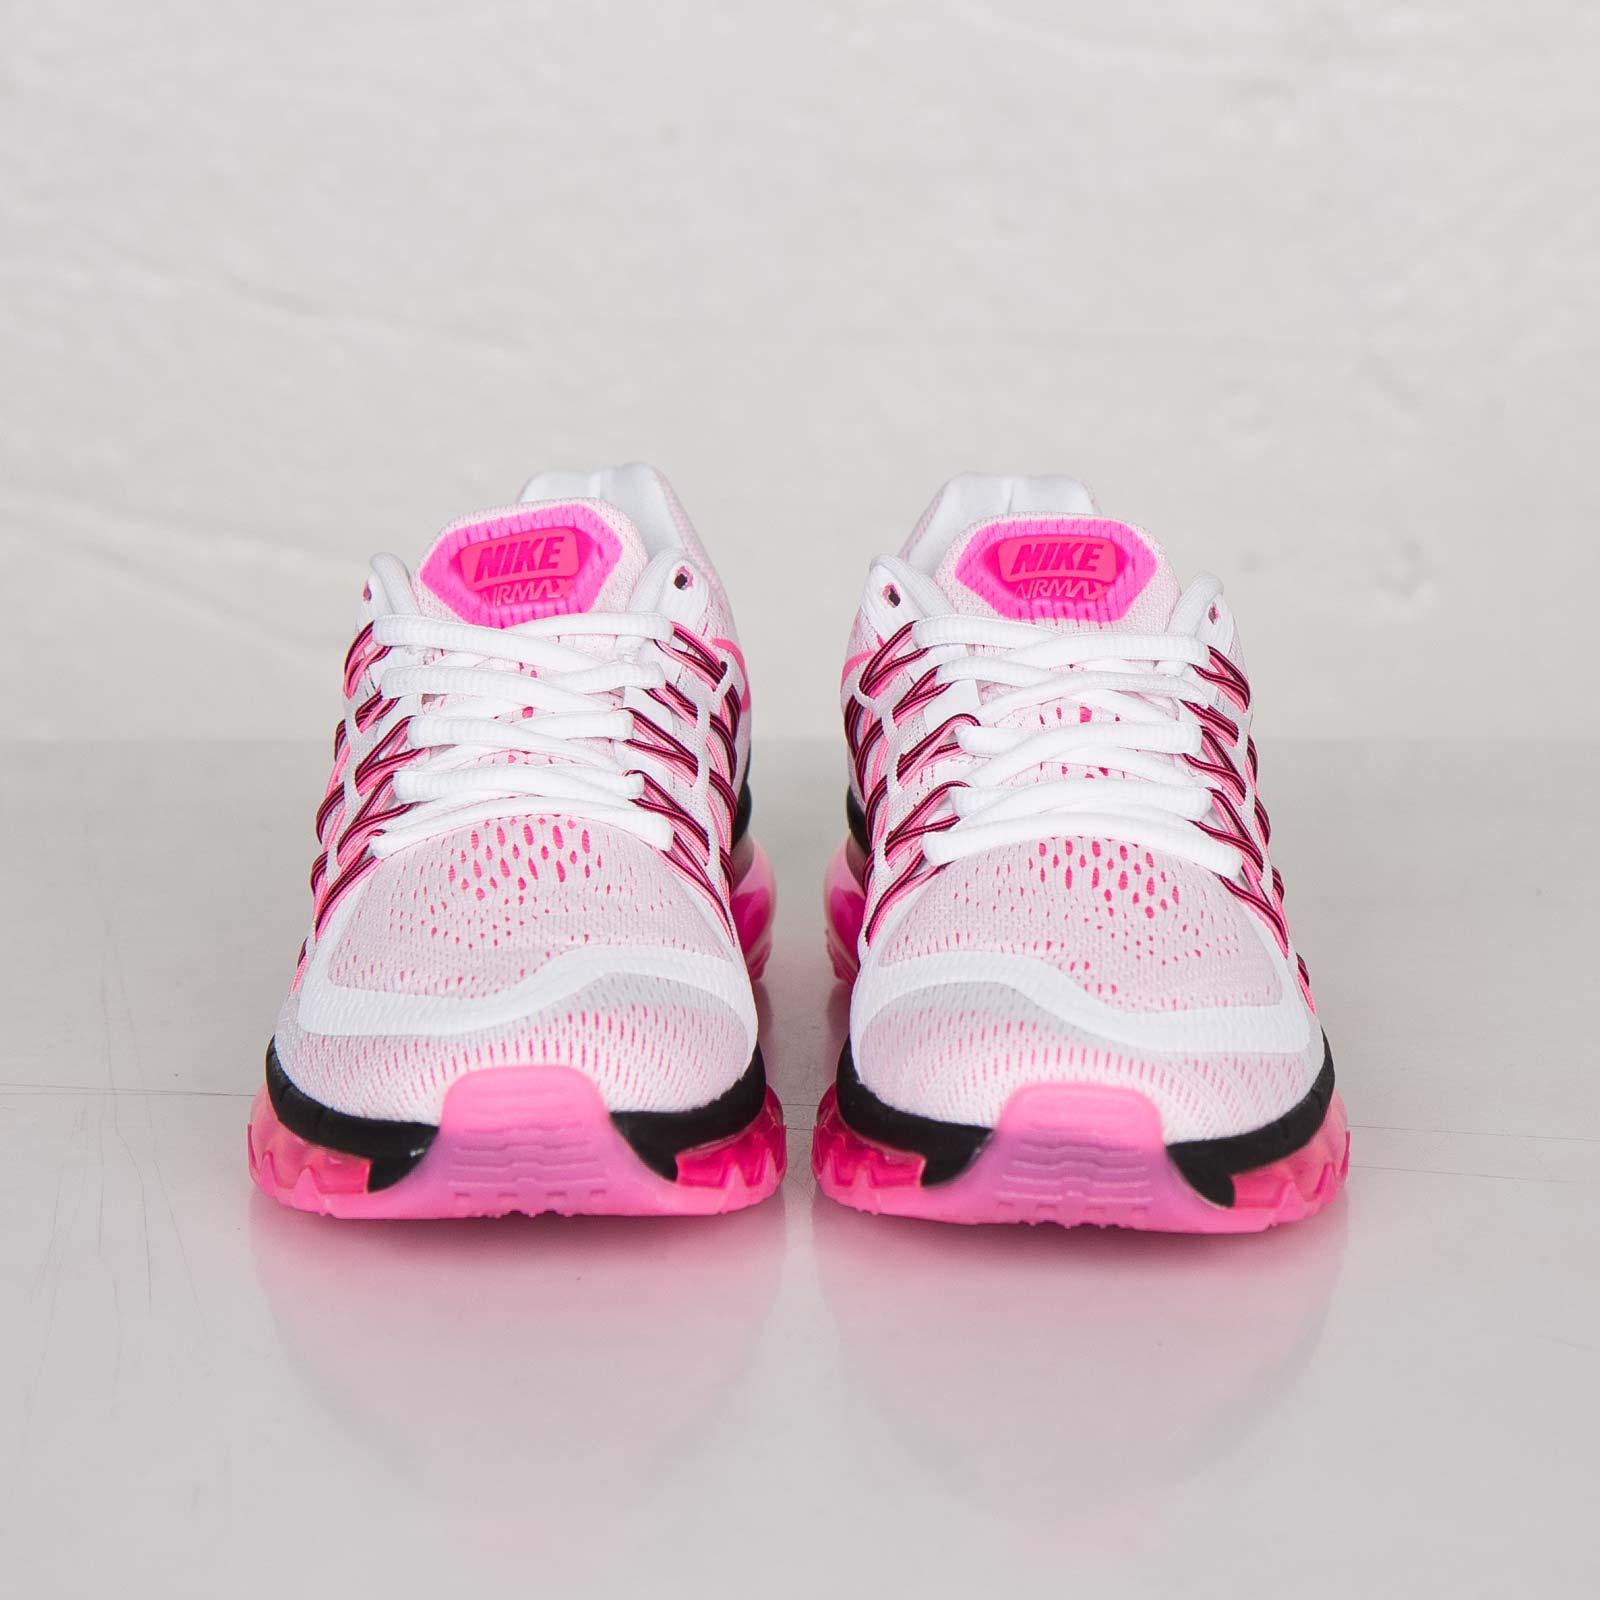 online retailer d1816 0692d Nike Wmns Air Max 2015 - 698903-106 - Sneakersnstuff   sneakers    streetwear online since 1999